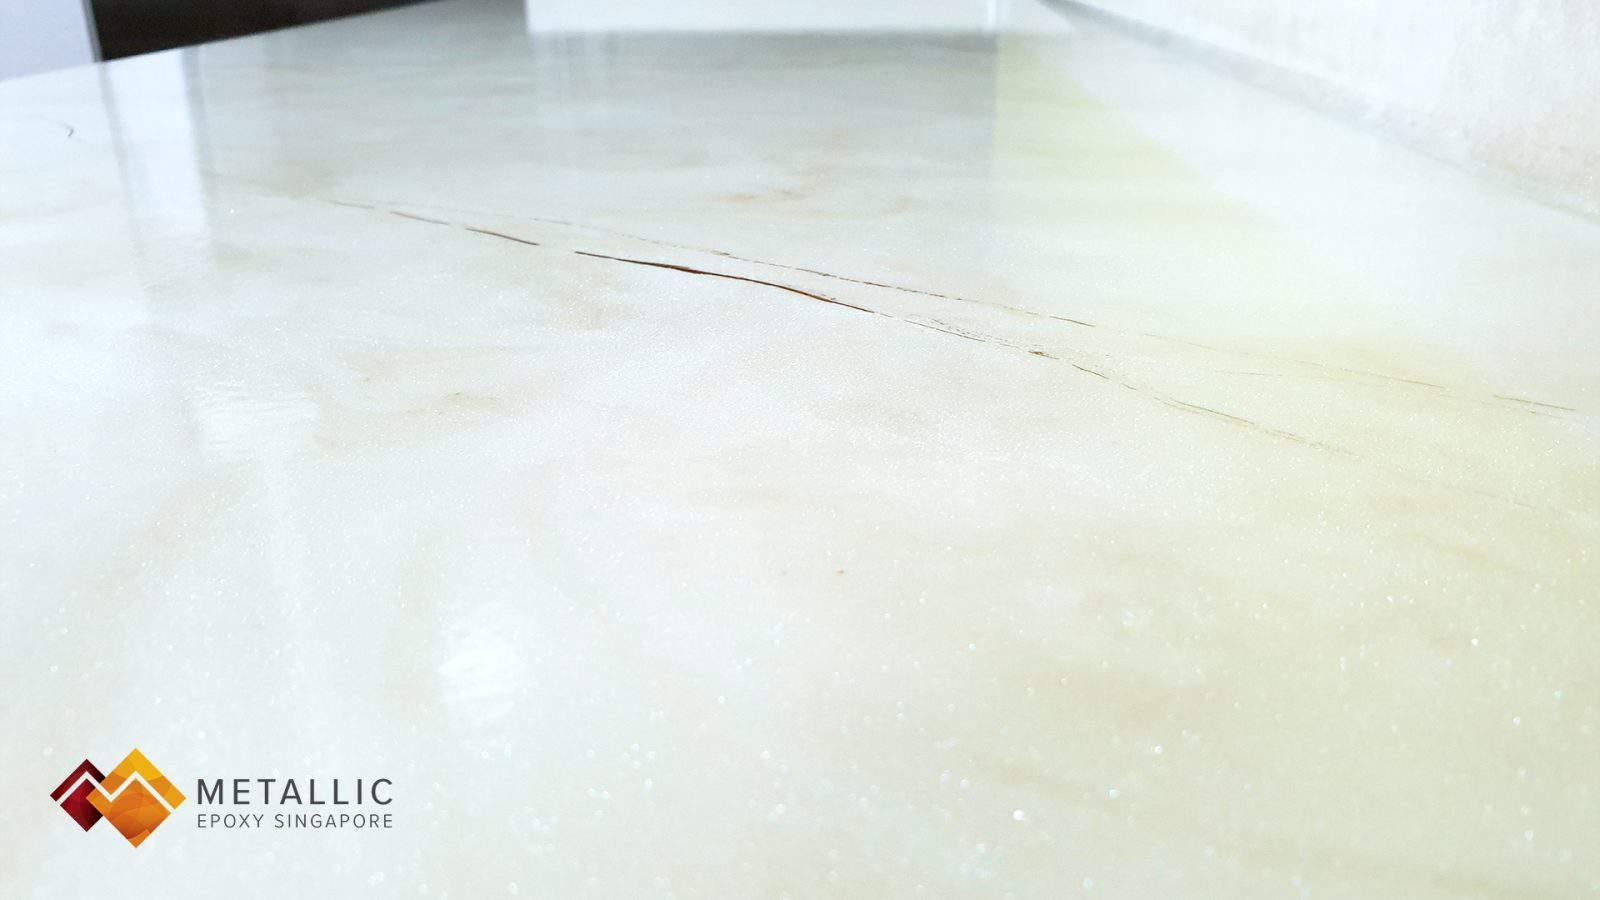 Metallic Epoxy Singapore Macael White Marble Countertop